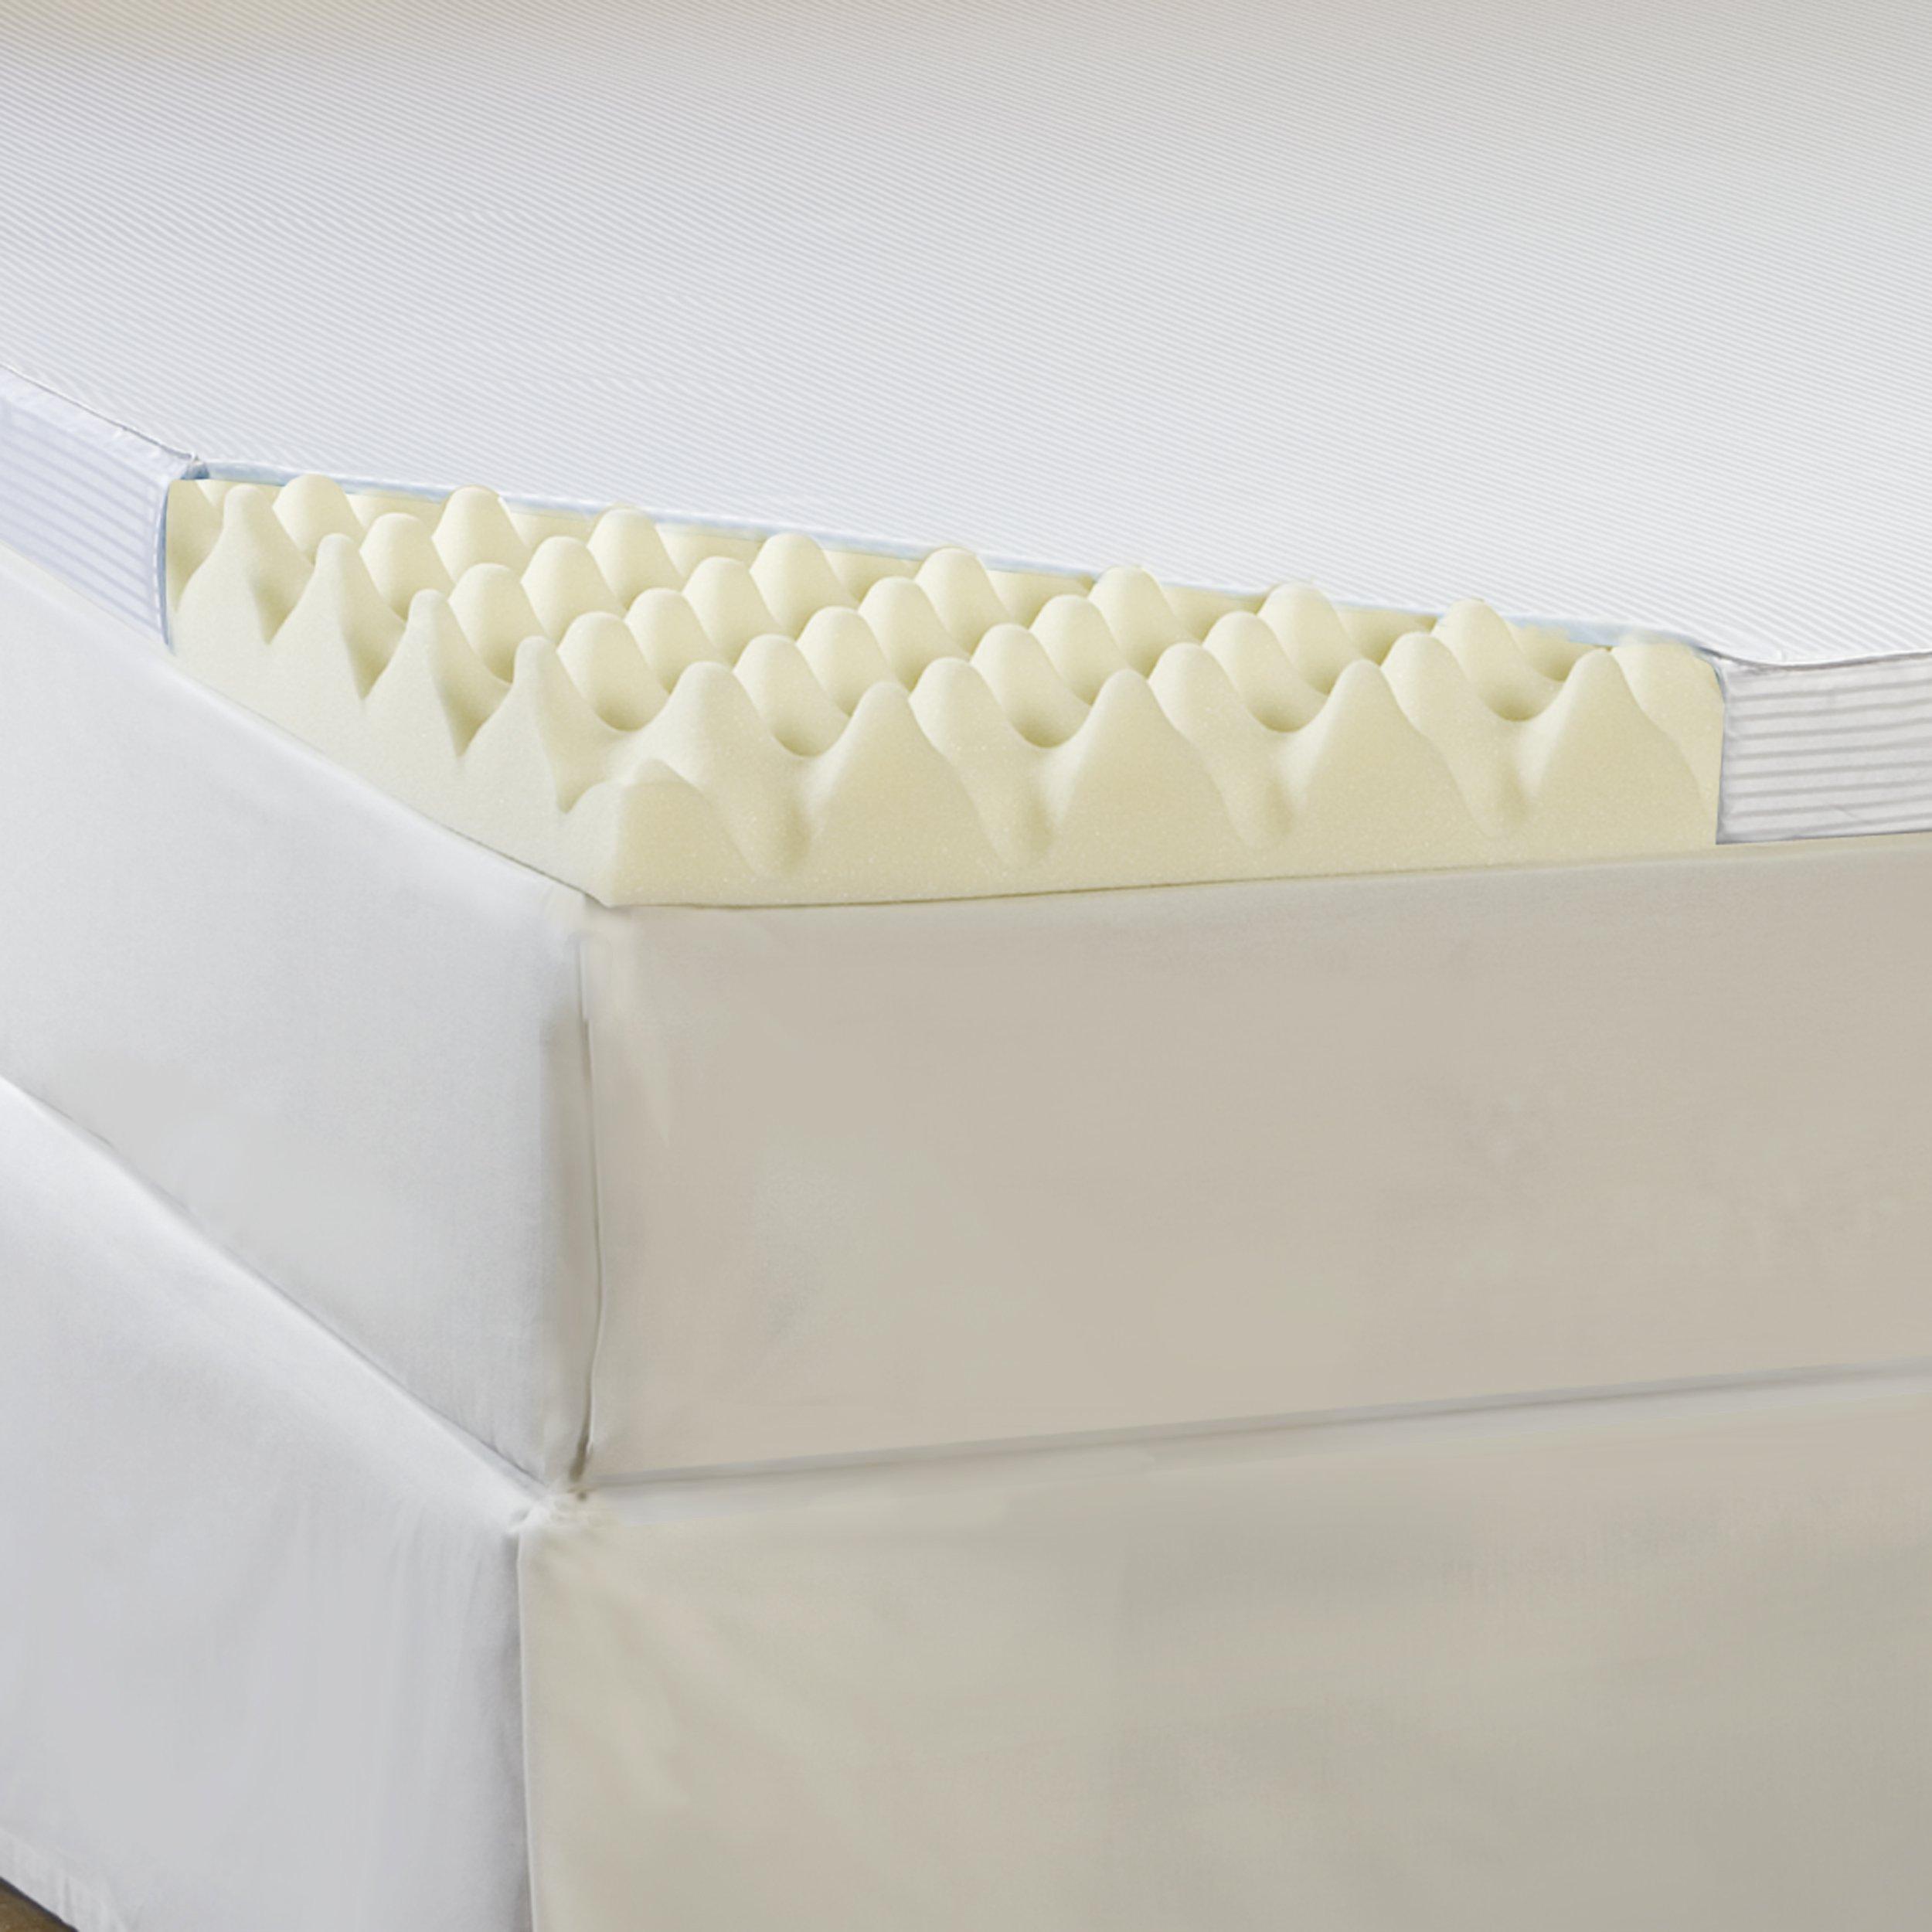 Hotel Comfort 3-Inch Big Comfort Memory Foam Topper with Polysilk Cover, Queen